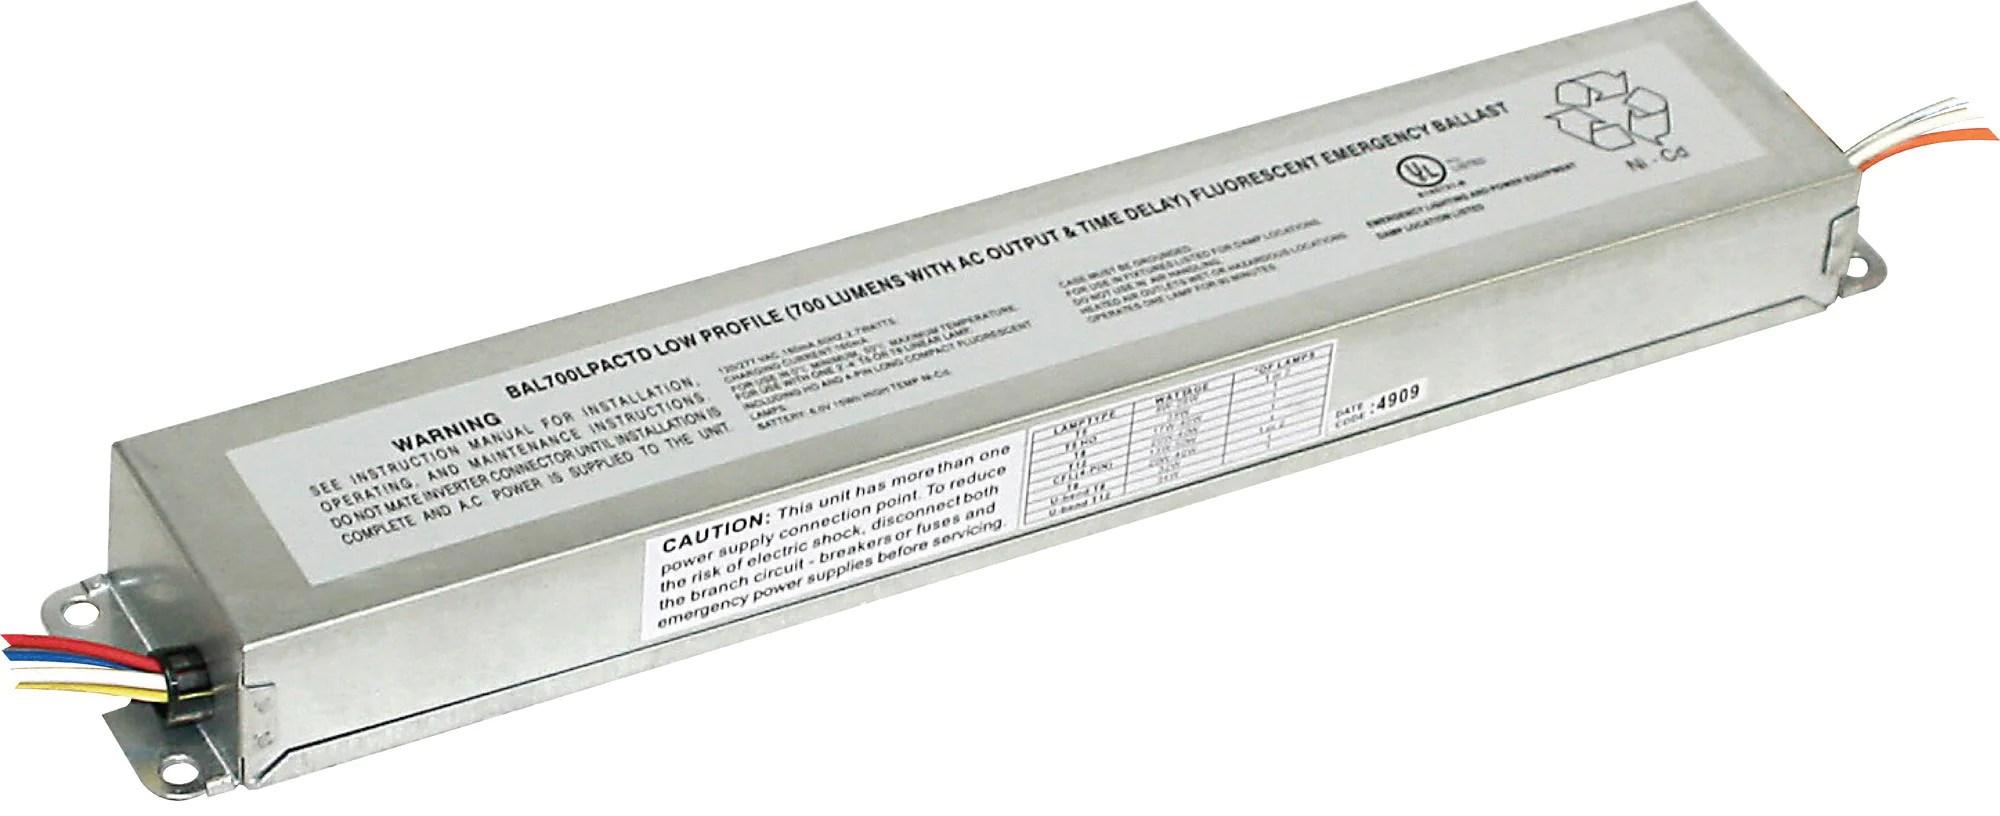 hight resolution of  https www unlimitedlights com daily https www bodine b50 2 lamp ballast wiring diagram further